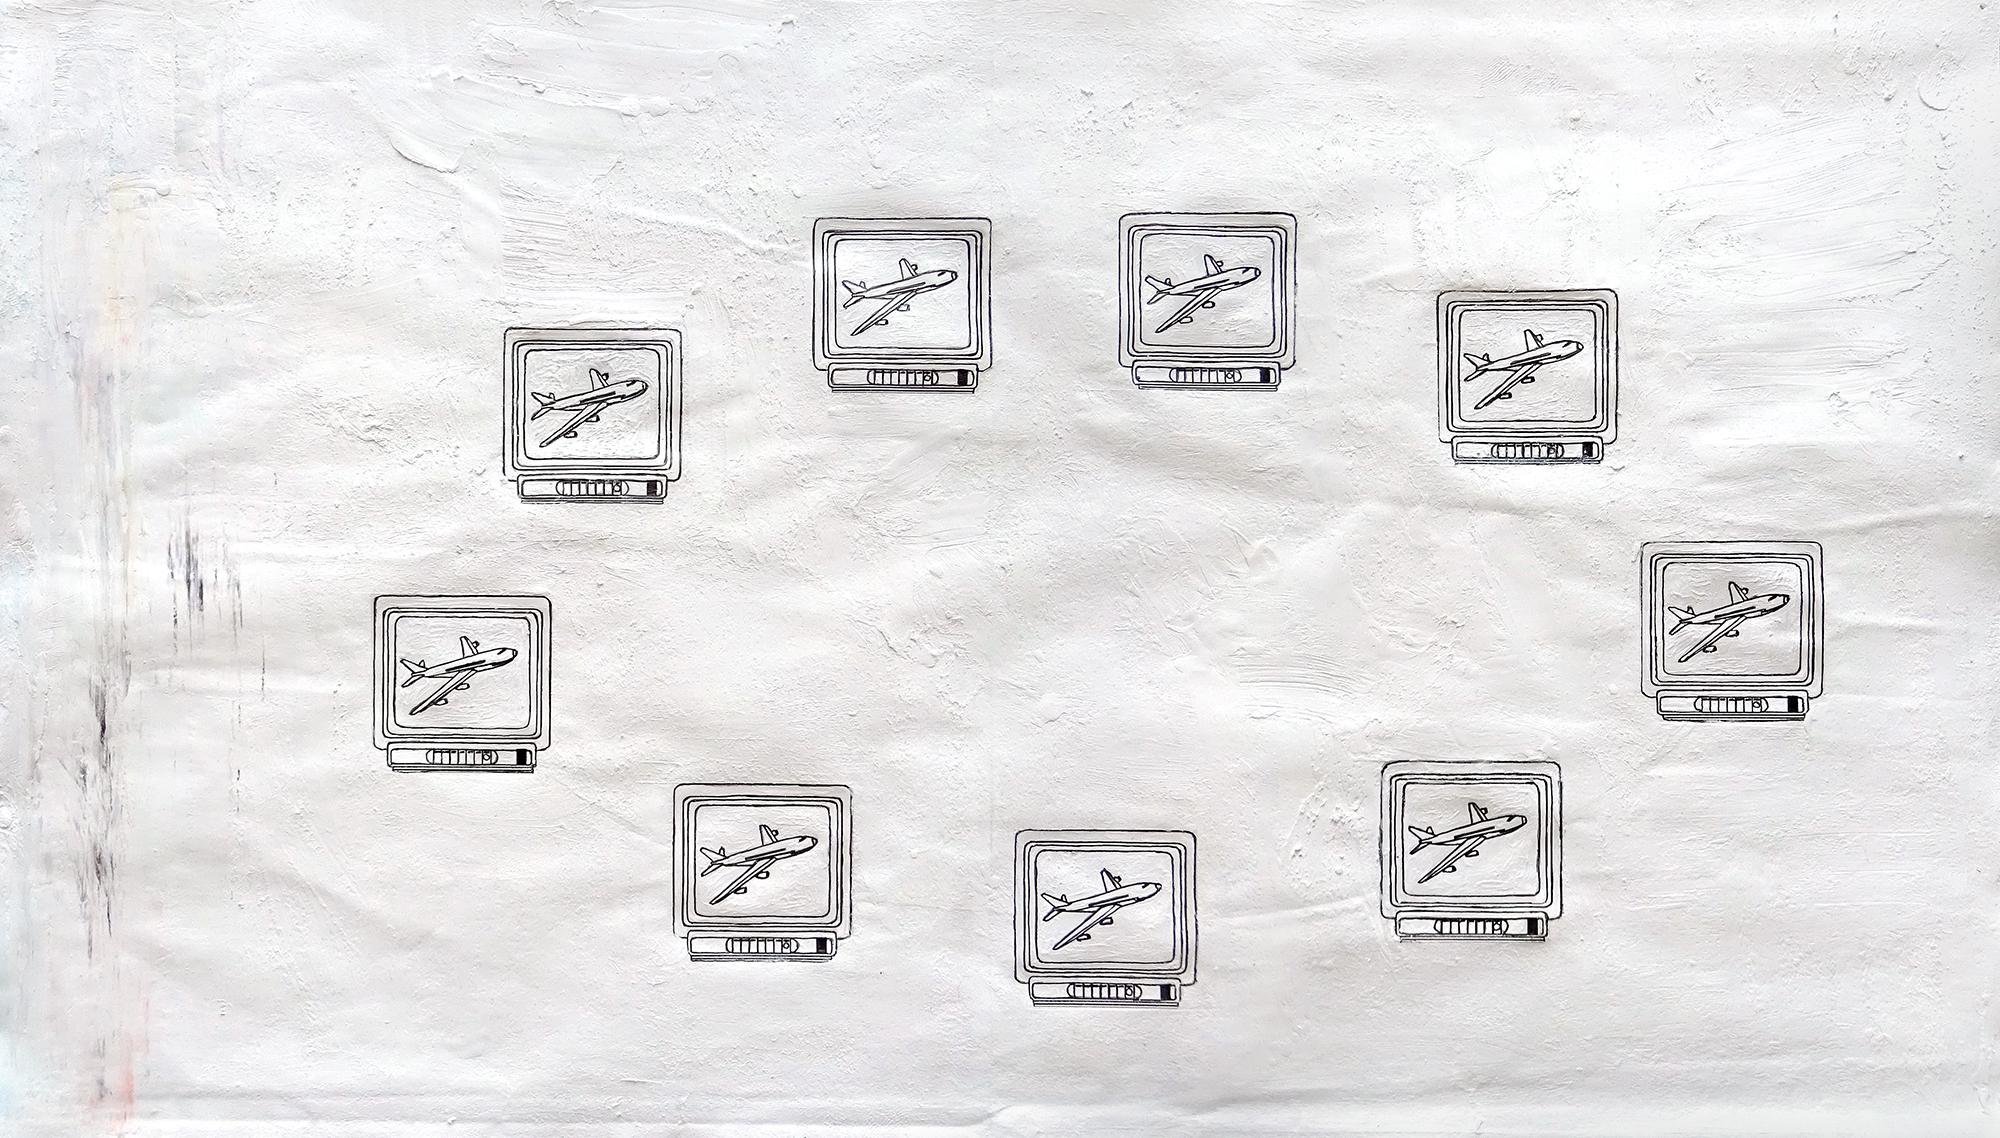 PlanesOnAScreen-HiRes-Merge.jpg